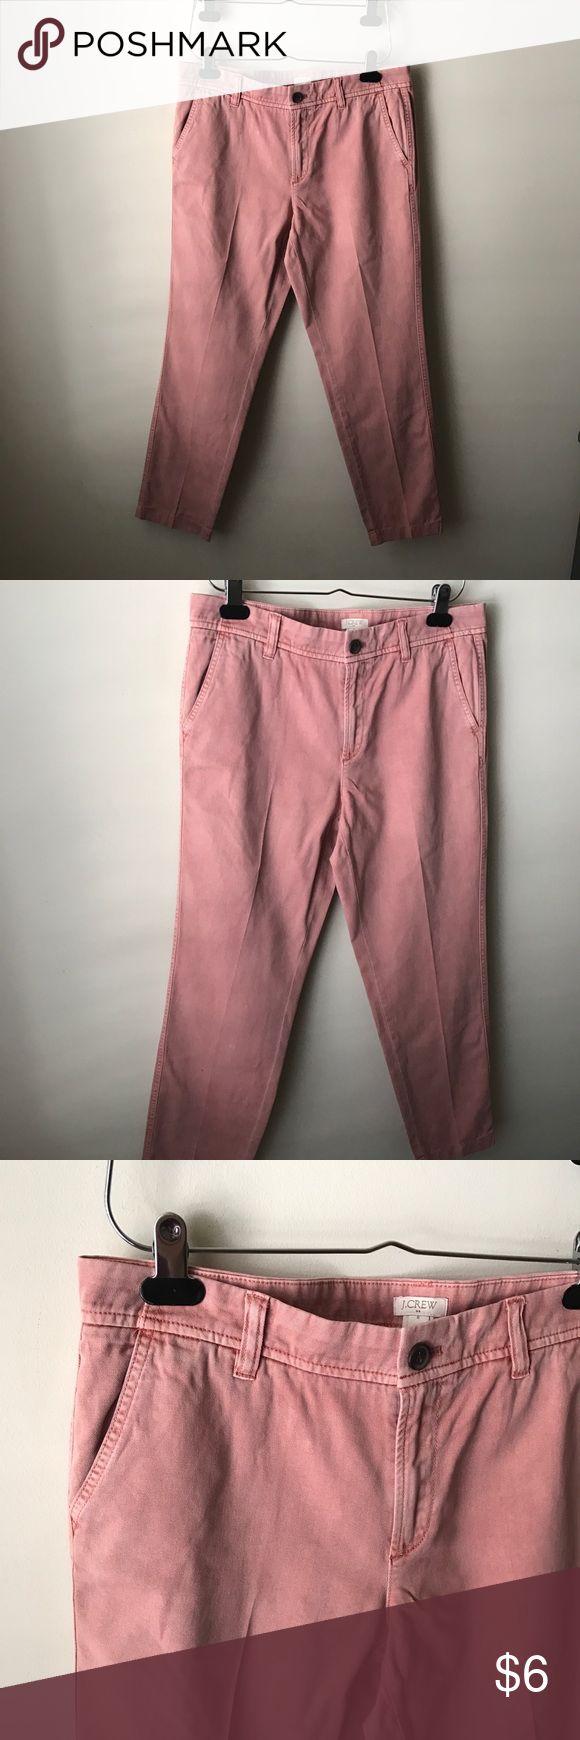 "J. Crew Factory blush pink pants Blush pink pants - button/zip fly closure - pockets - cotton - waist across measures 16.5"" - front rise measures 9.5"" - inseam measures 27"" - size 6 J. Crew Factory Pants"